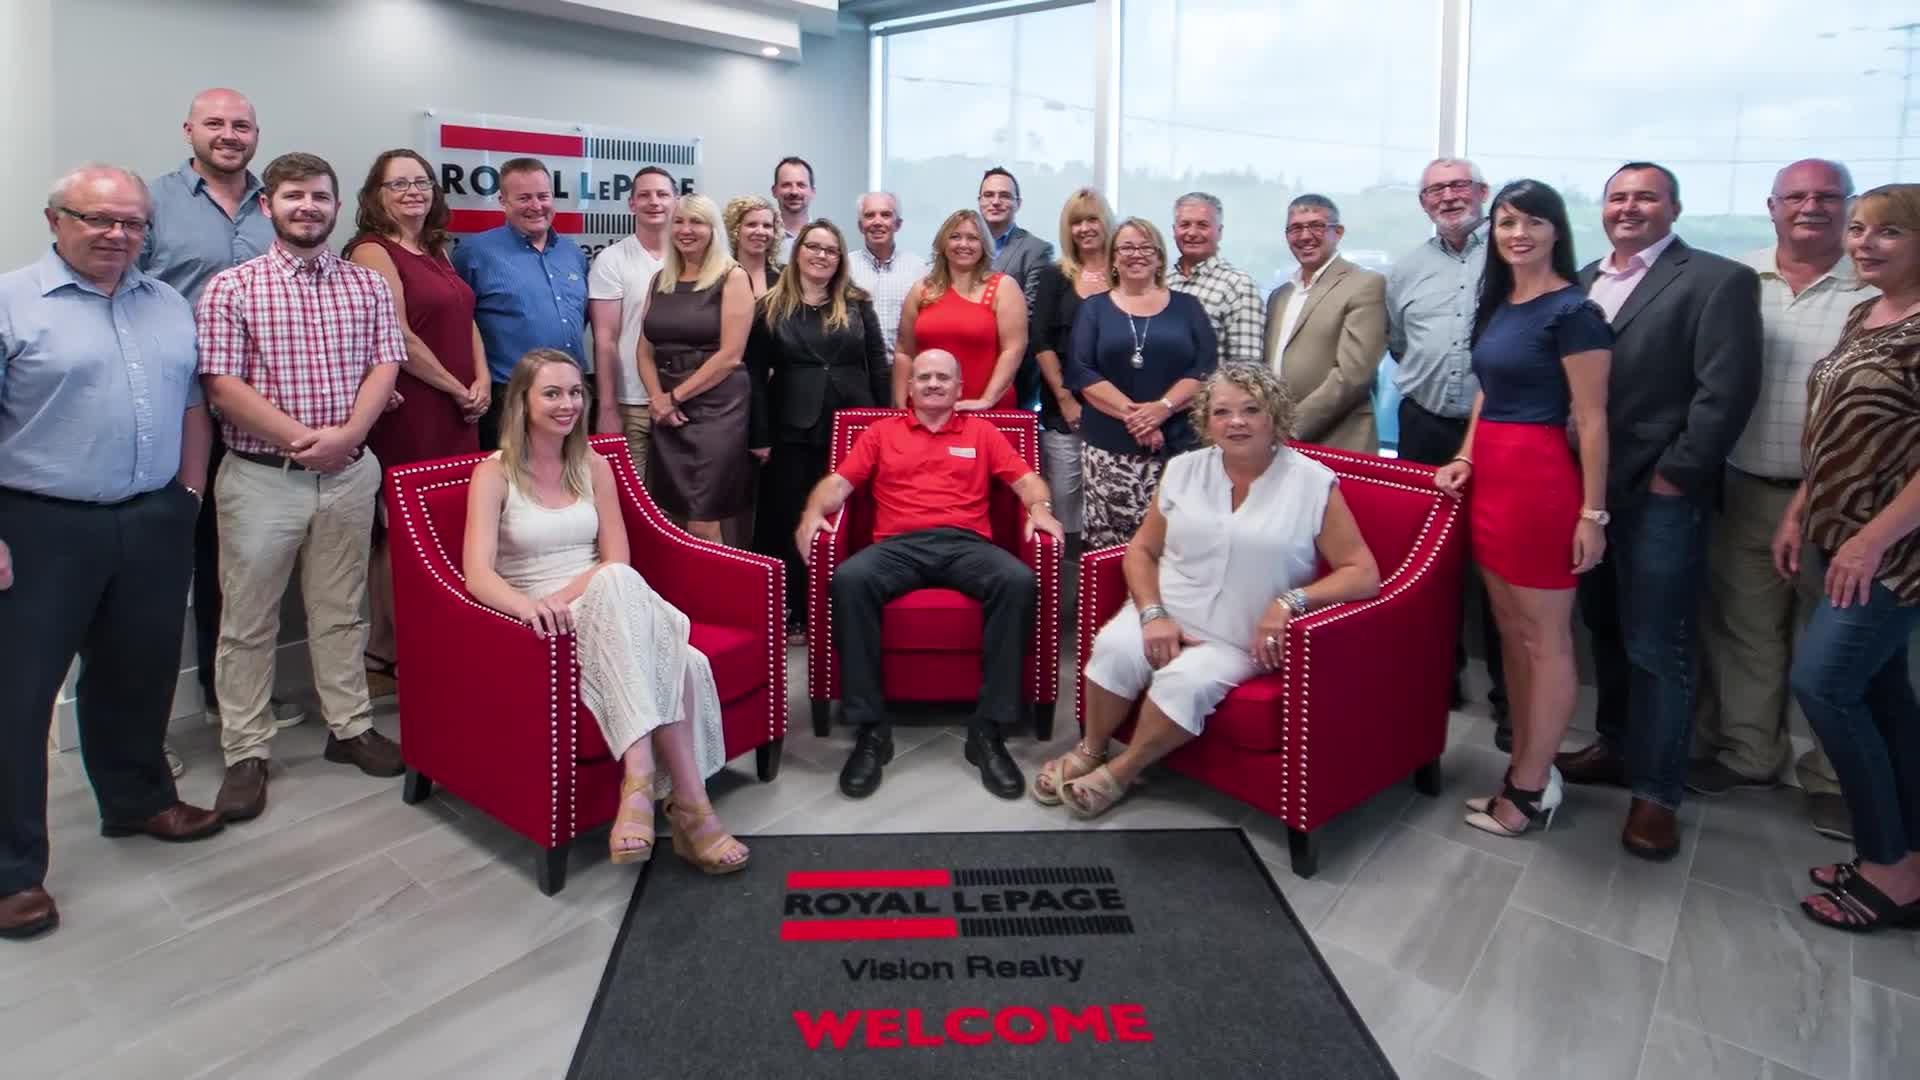 Royal LePage Vision Realty - Real Estate Brokers & Sales Representatives - 709-685-8032